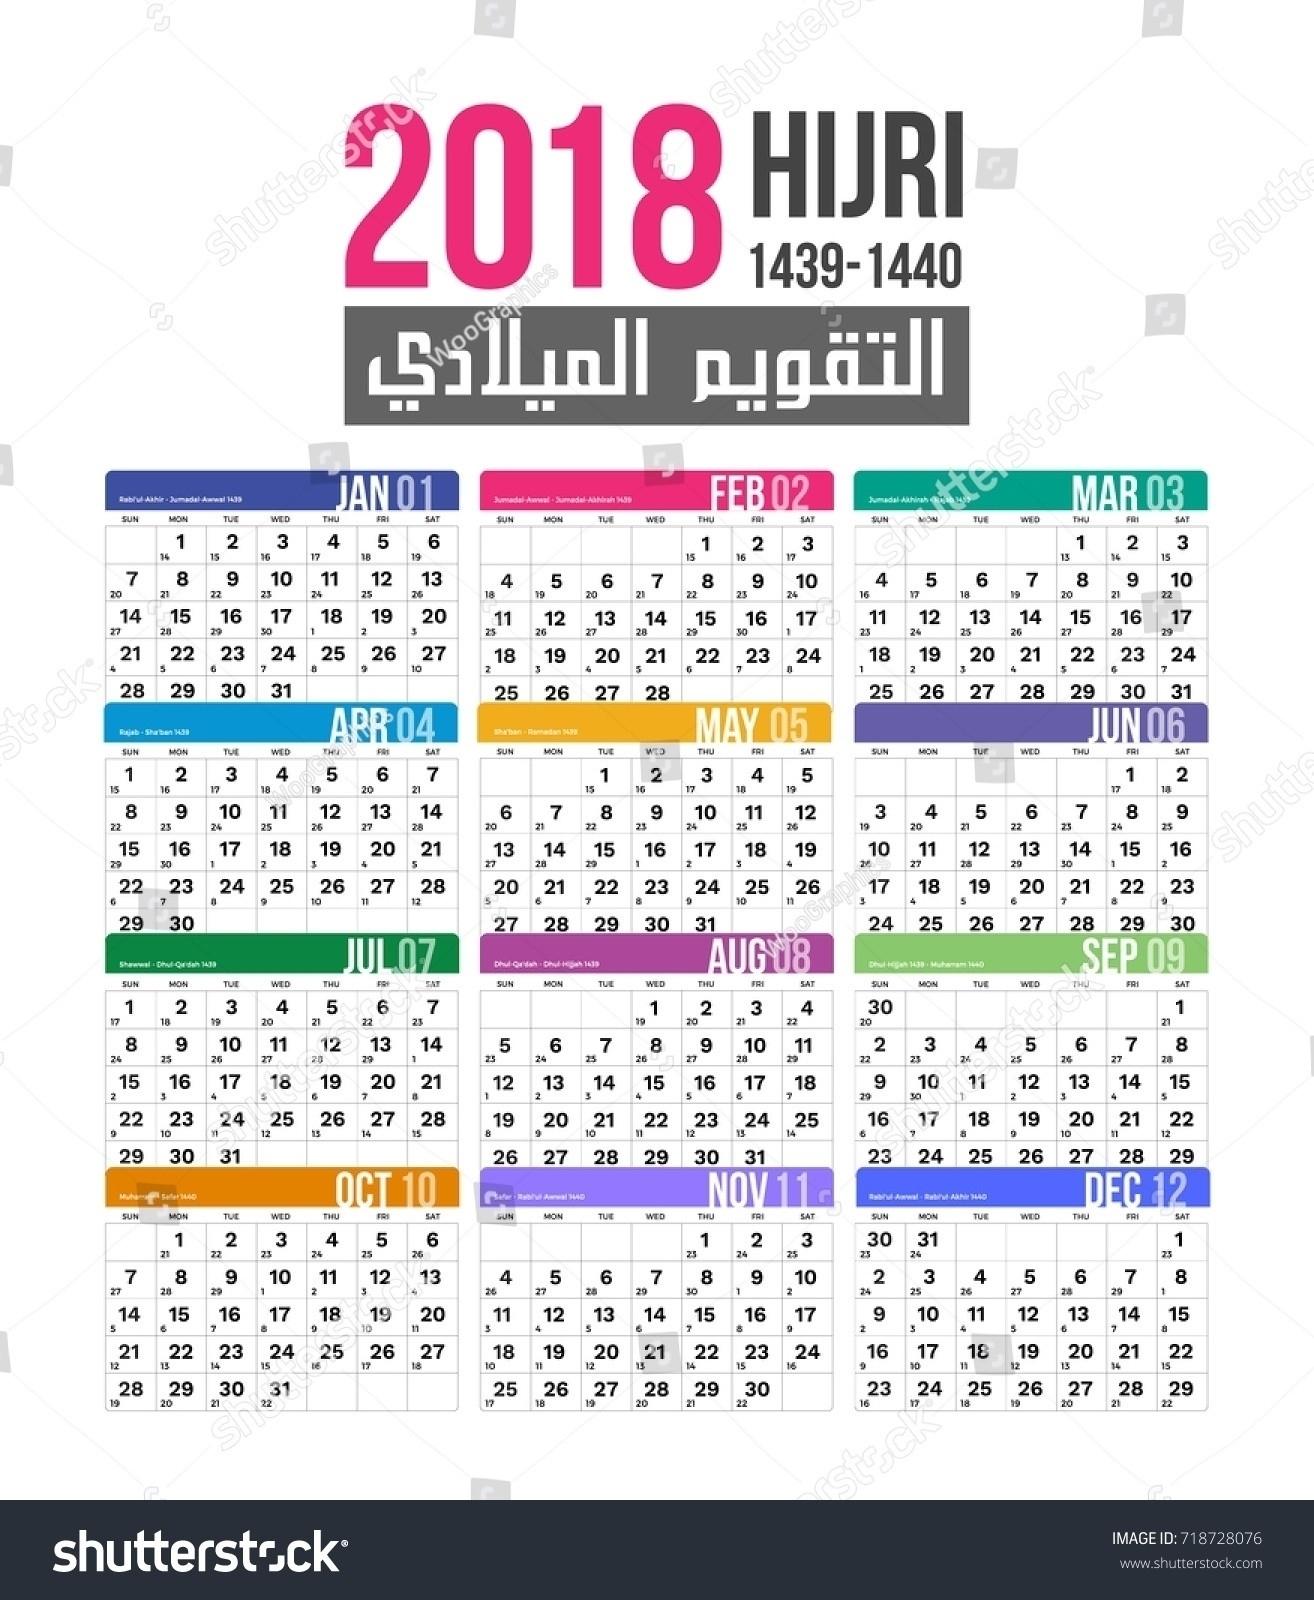 Saudi Islamic Month Kalendar Com | Template Calendar Printable throughout Saudi Islamic Month Kalendar Com